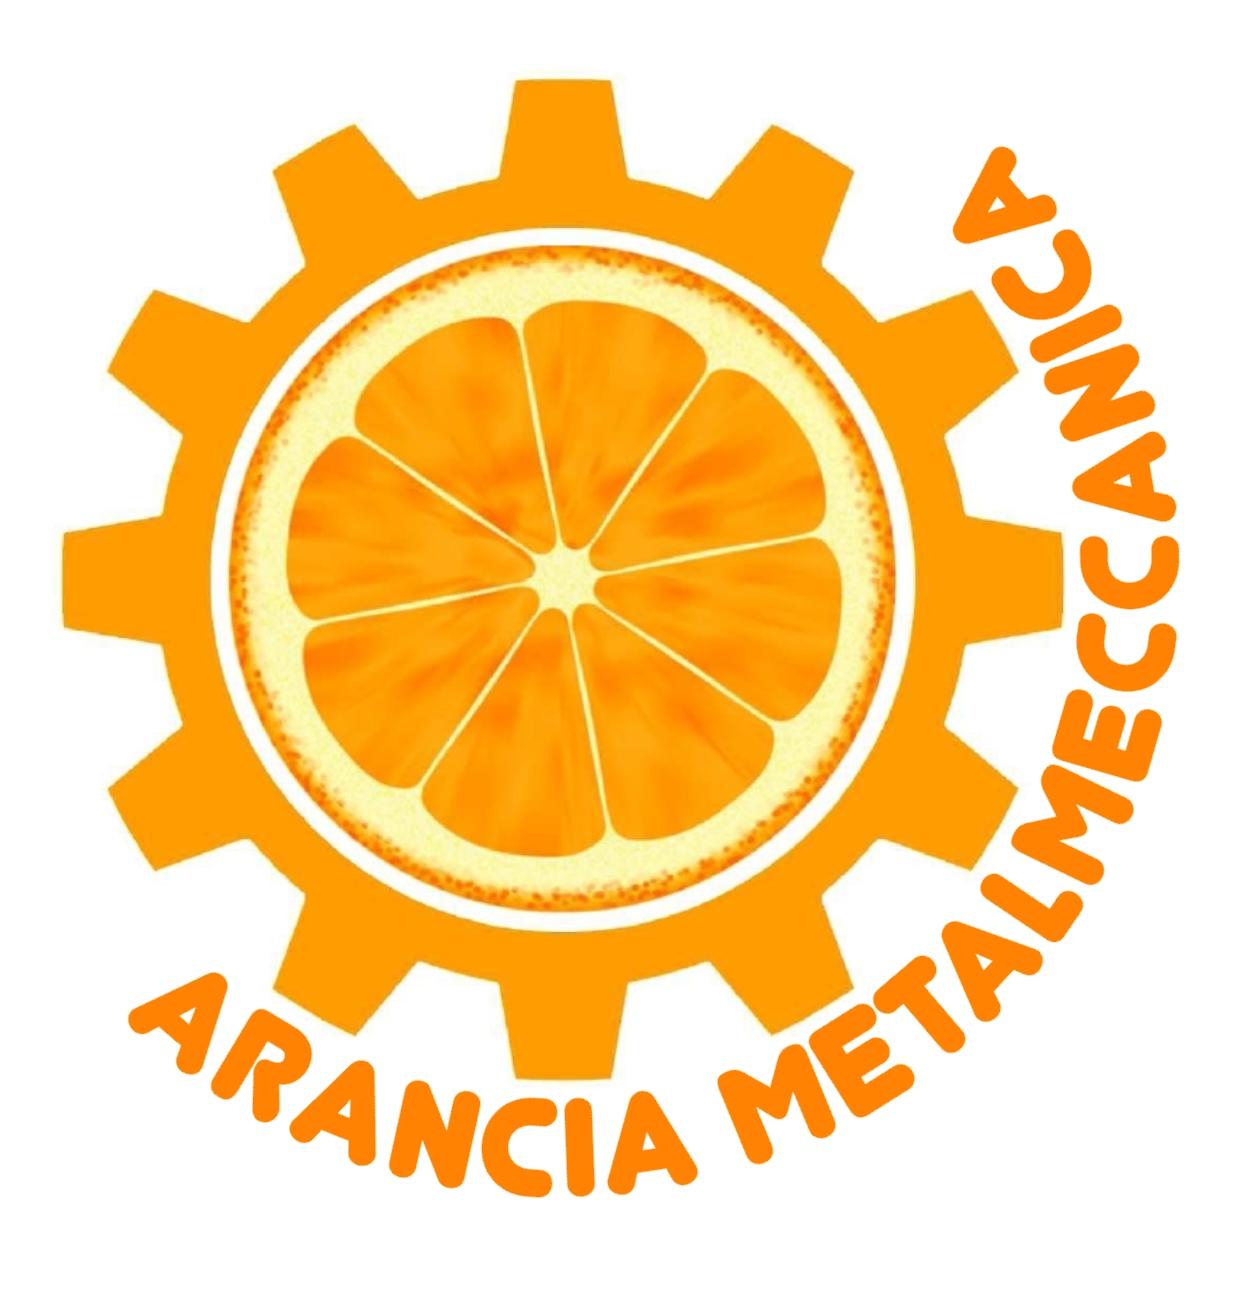 aranica metalmeccanica